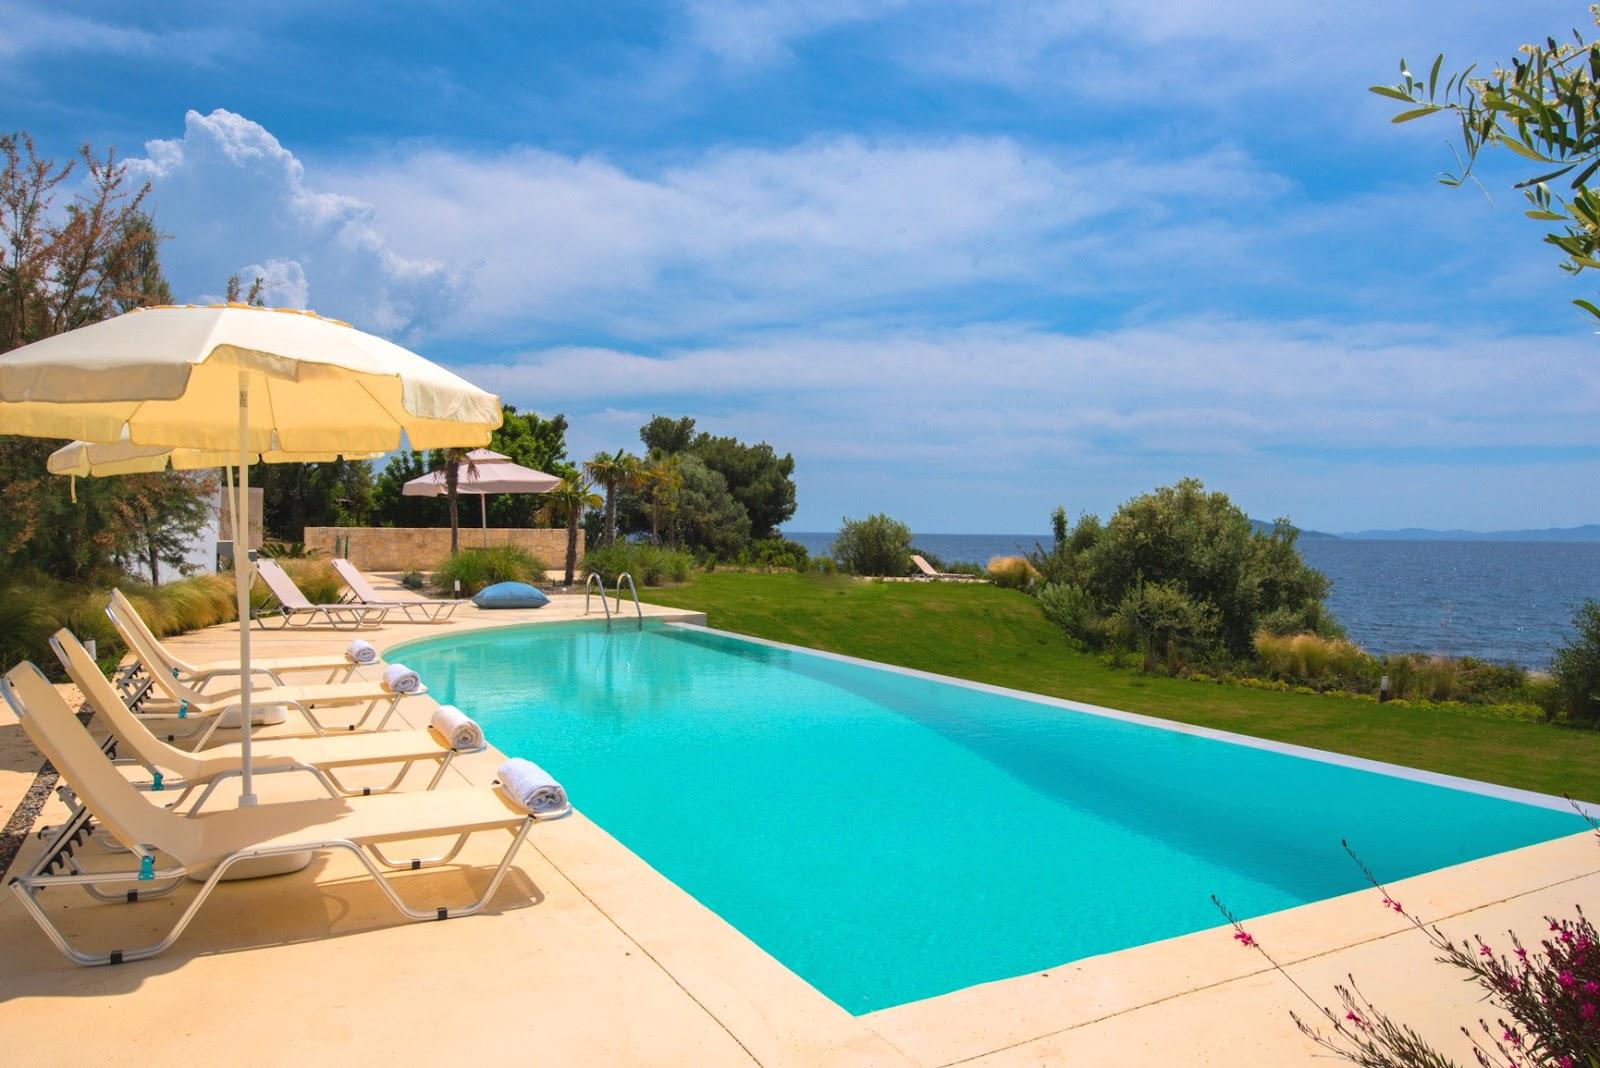 Halkidiki Real Estate Services: Beachfront villas for sale